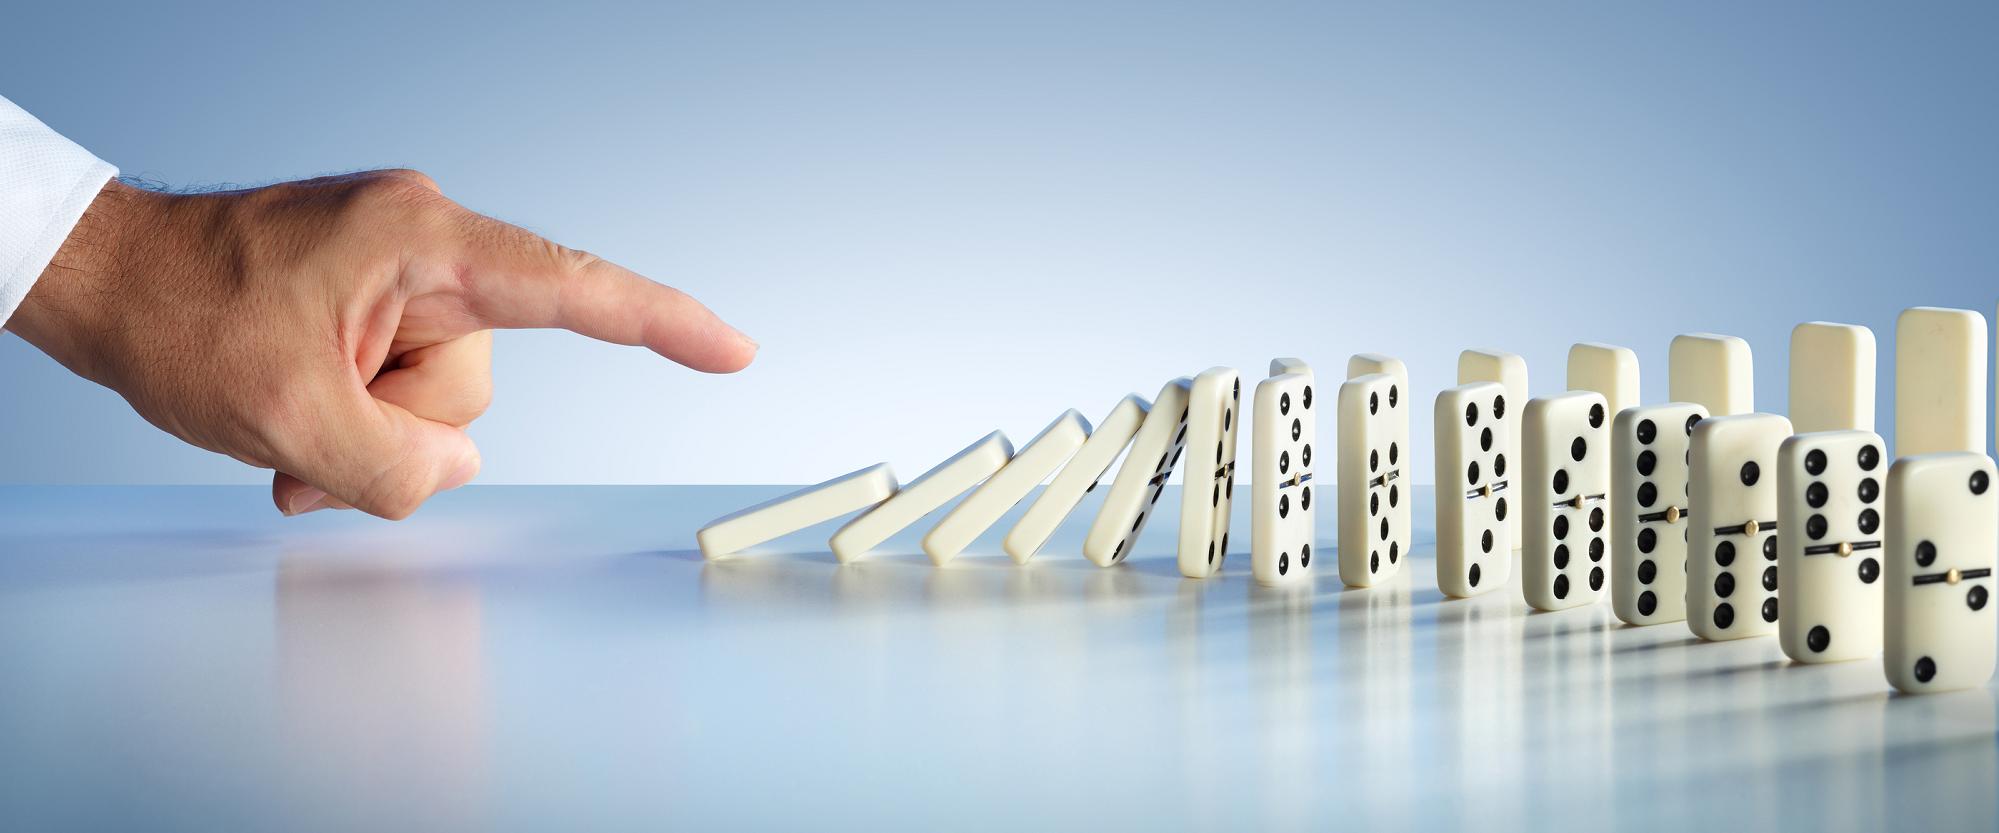 Domino Effect Blocks Collapse